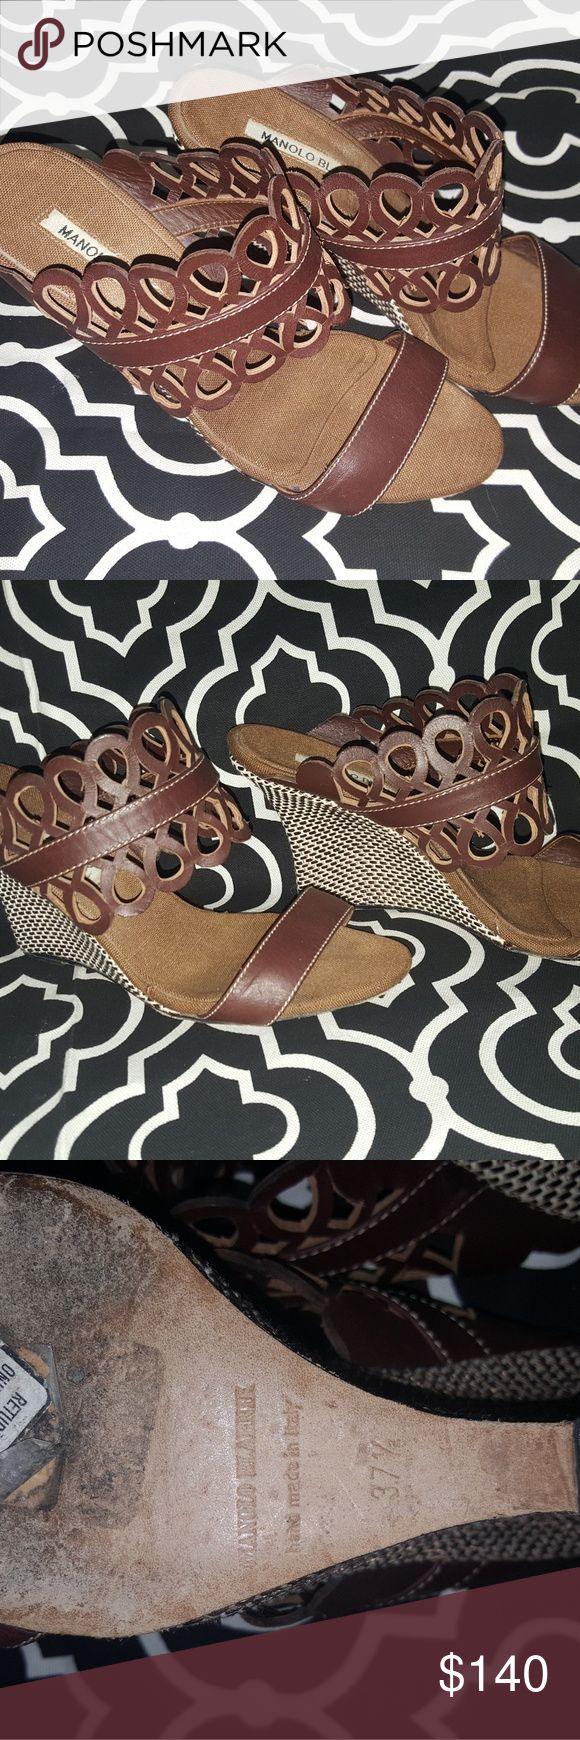 Manolo Blahnik Gorgeous Manolo Blahnik wedges Manolo Blahnik Shoes Wedges